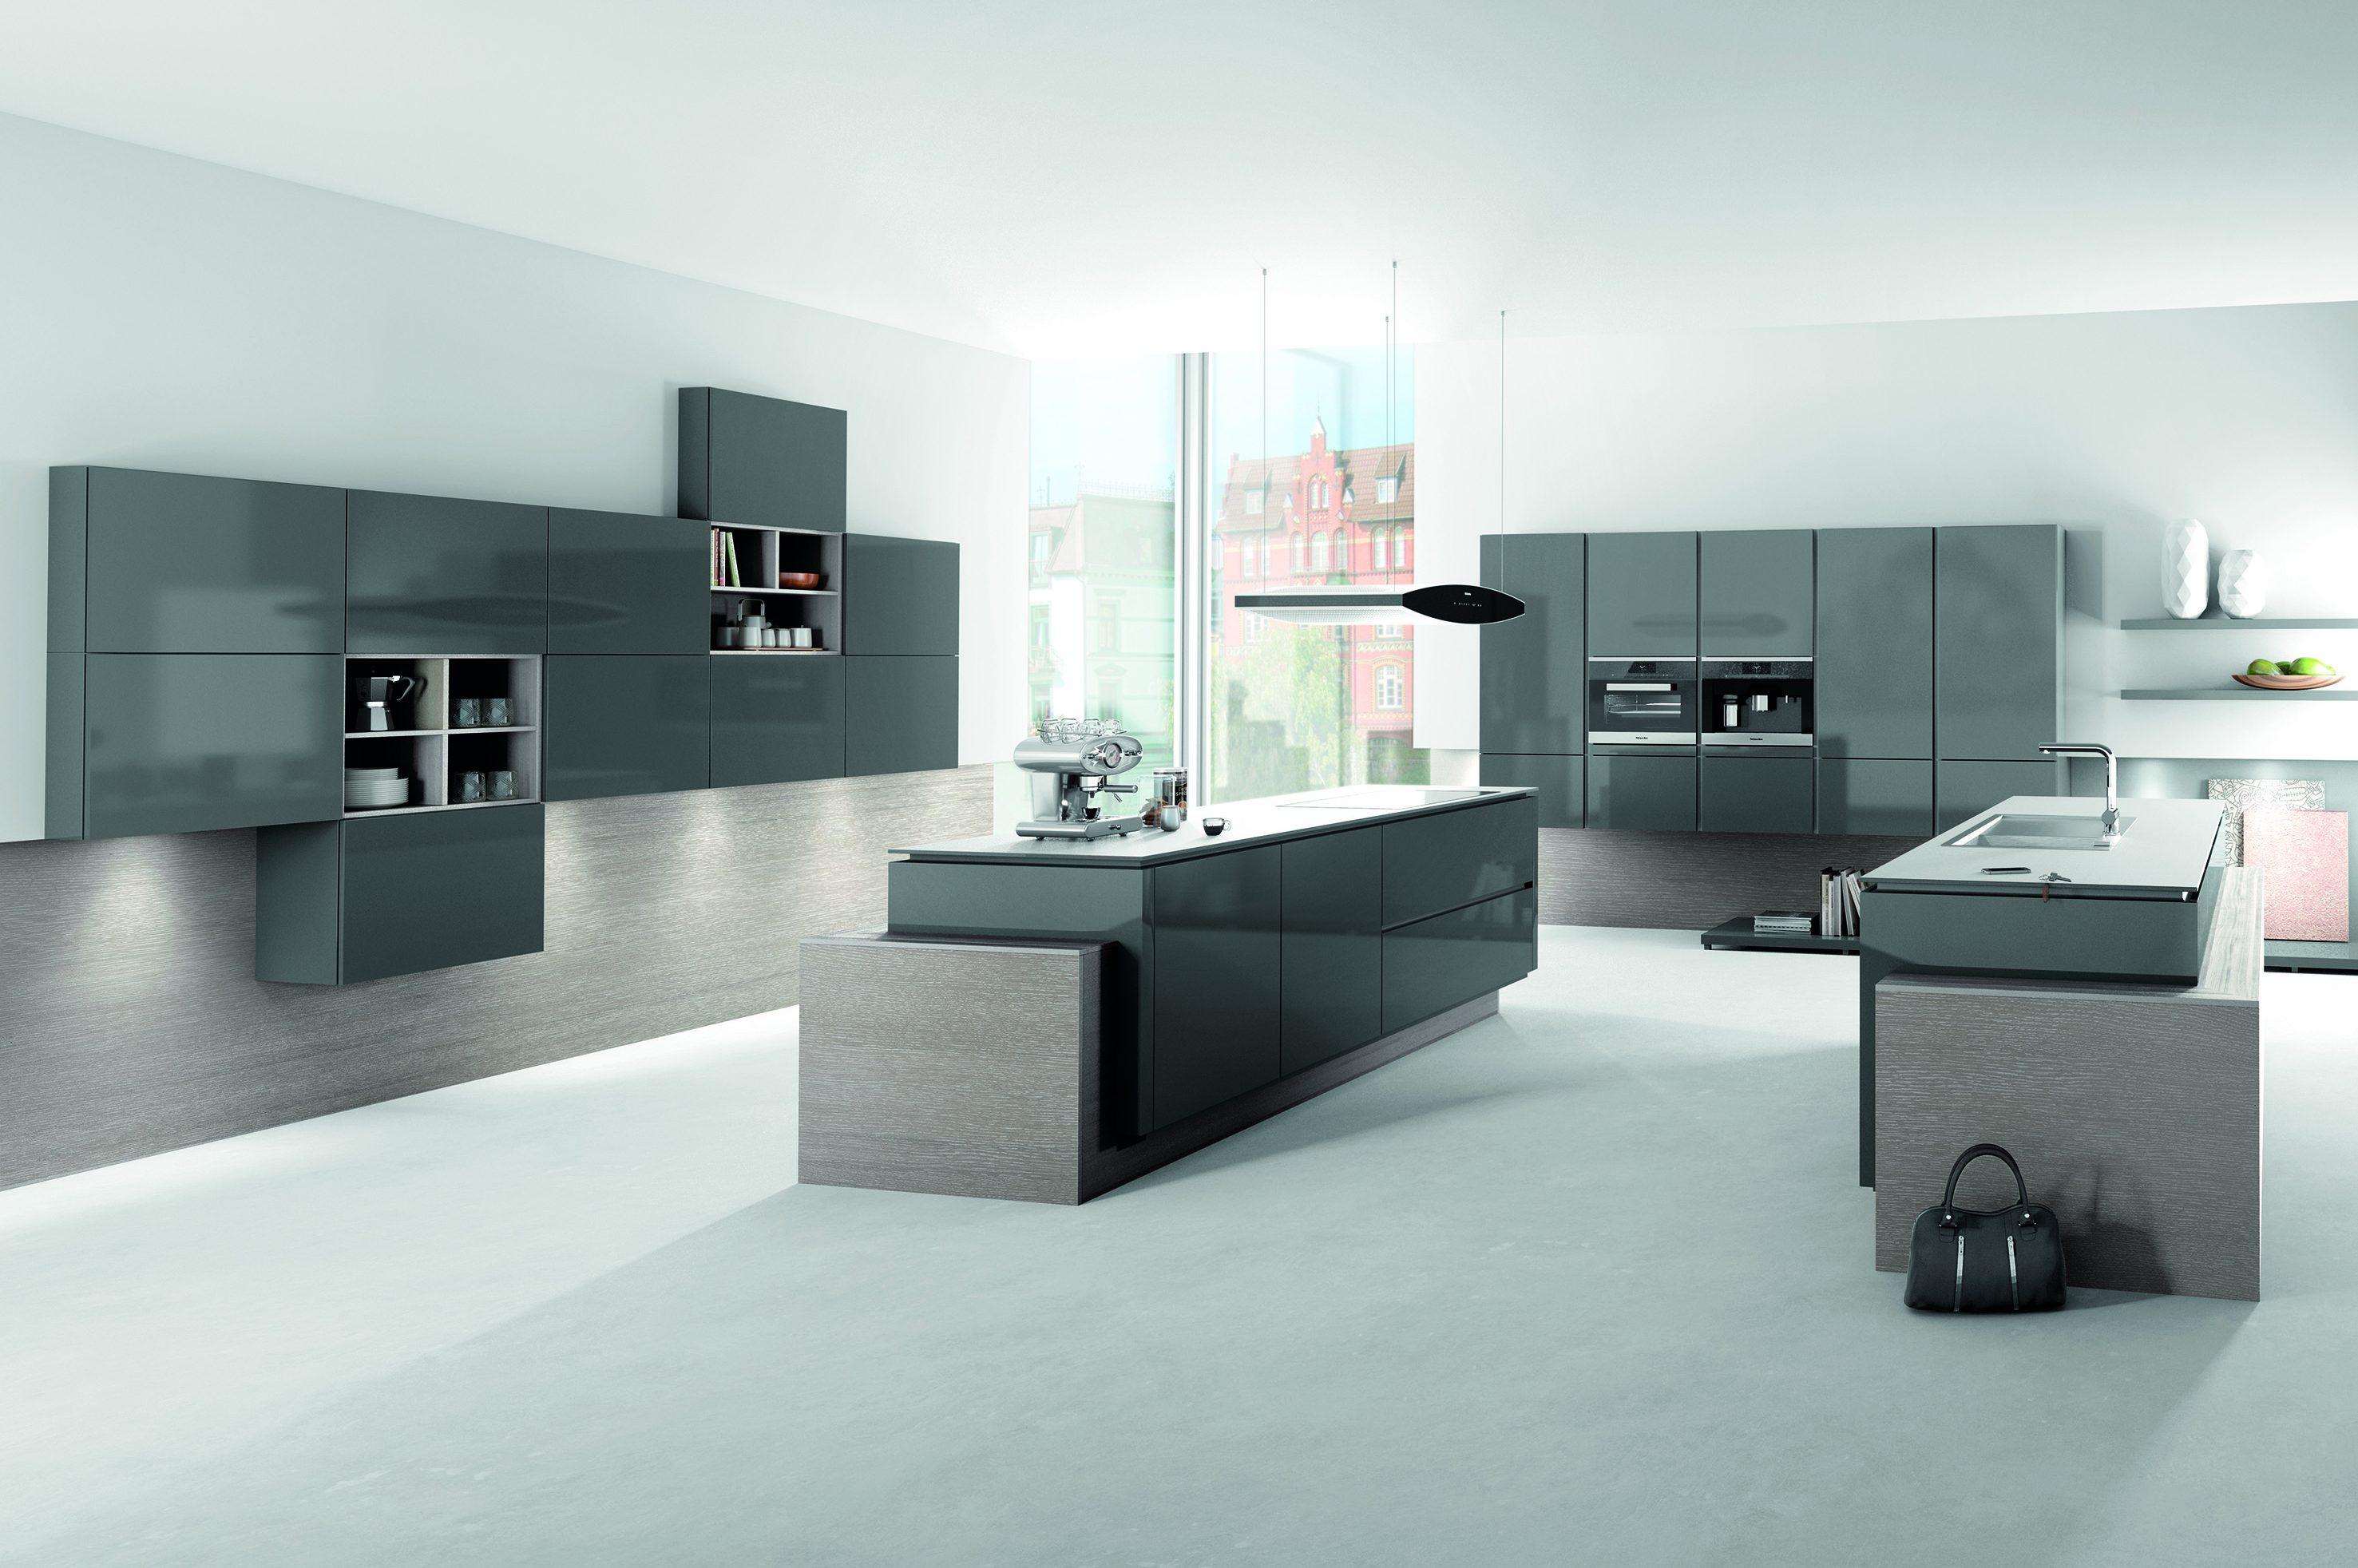 Kchen Grau. Excellent Kitchen Dining Chairs Carpet Grau Design With ...